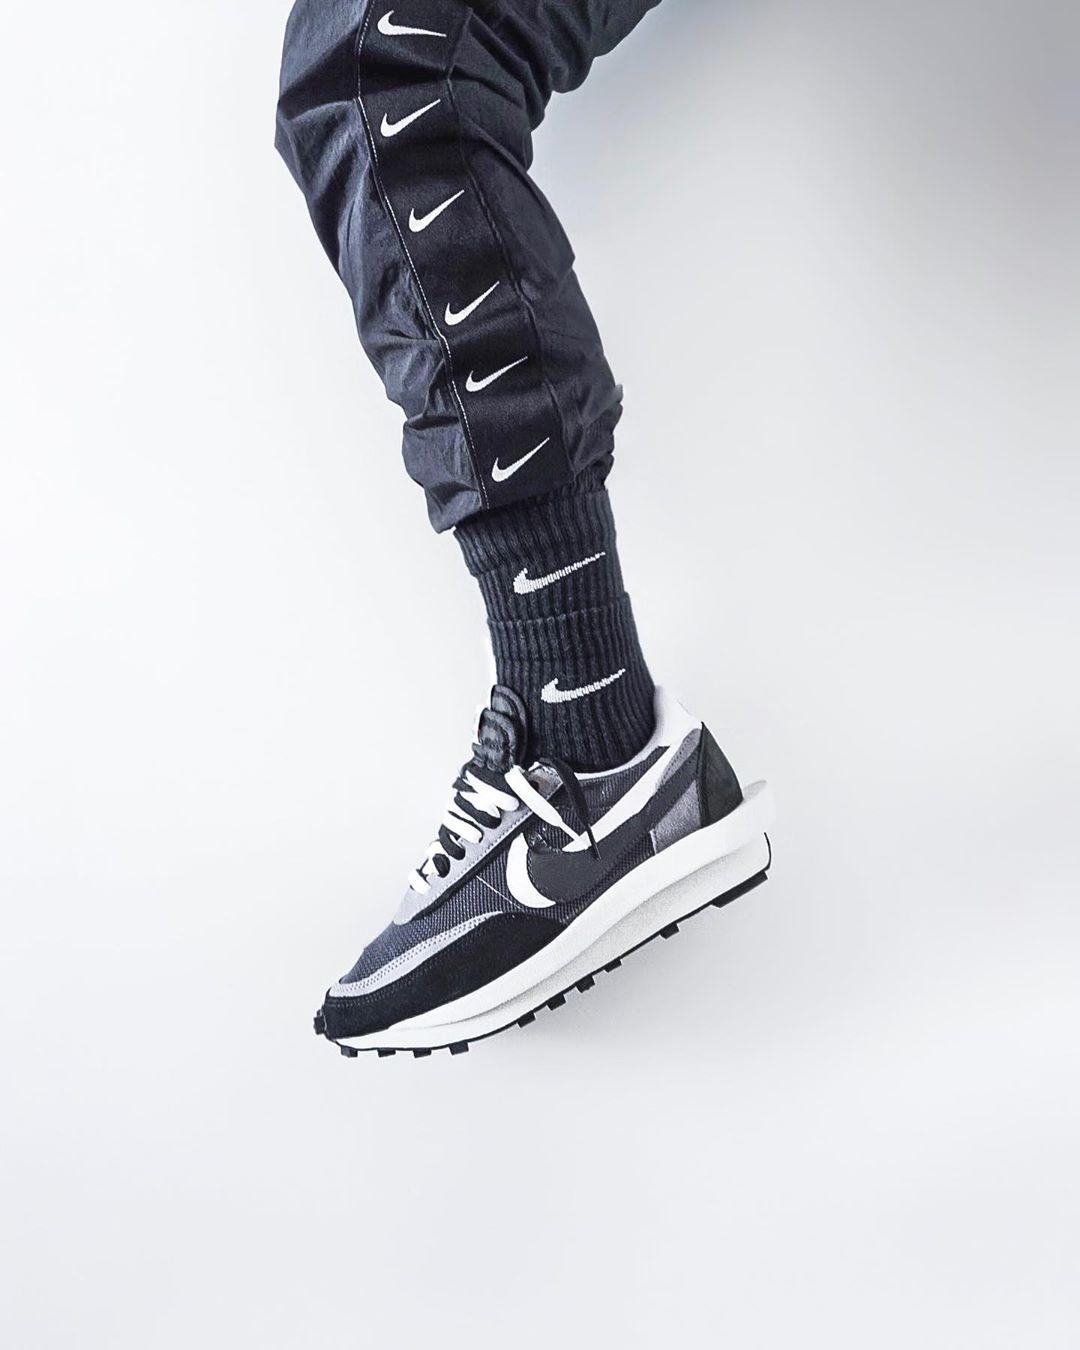 adidas,Nike,Air Jordan 1,AF1,A 明早发售白丝绸 EDC x AJ1 Mid 别忘了!一周球鞋美图!12.06